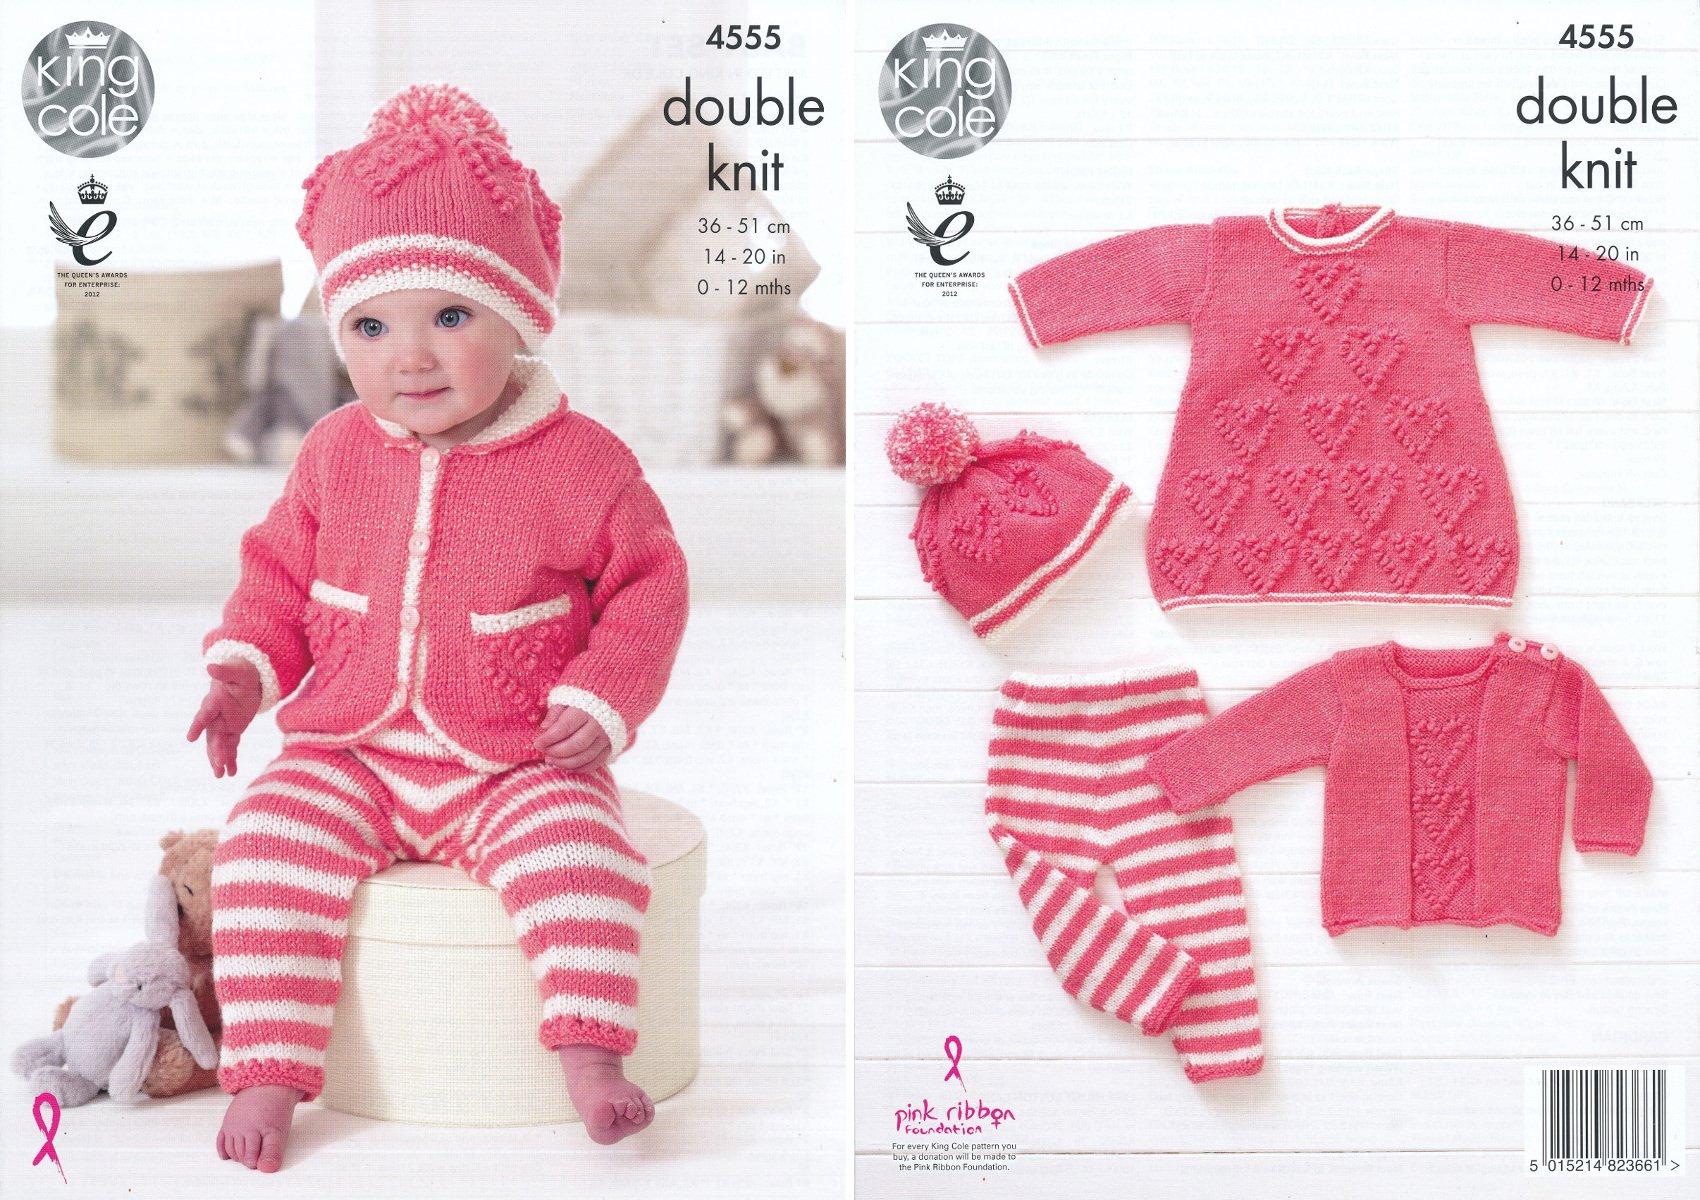 "King Cole 3773 Baby/'s Dress Jacket /& Hat DK Knitting Pattern Sizes 12-20/"""